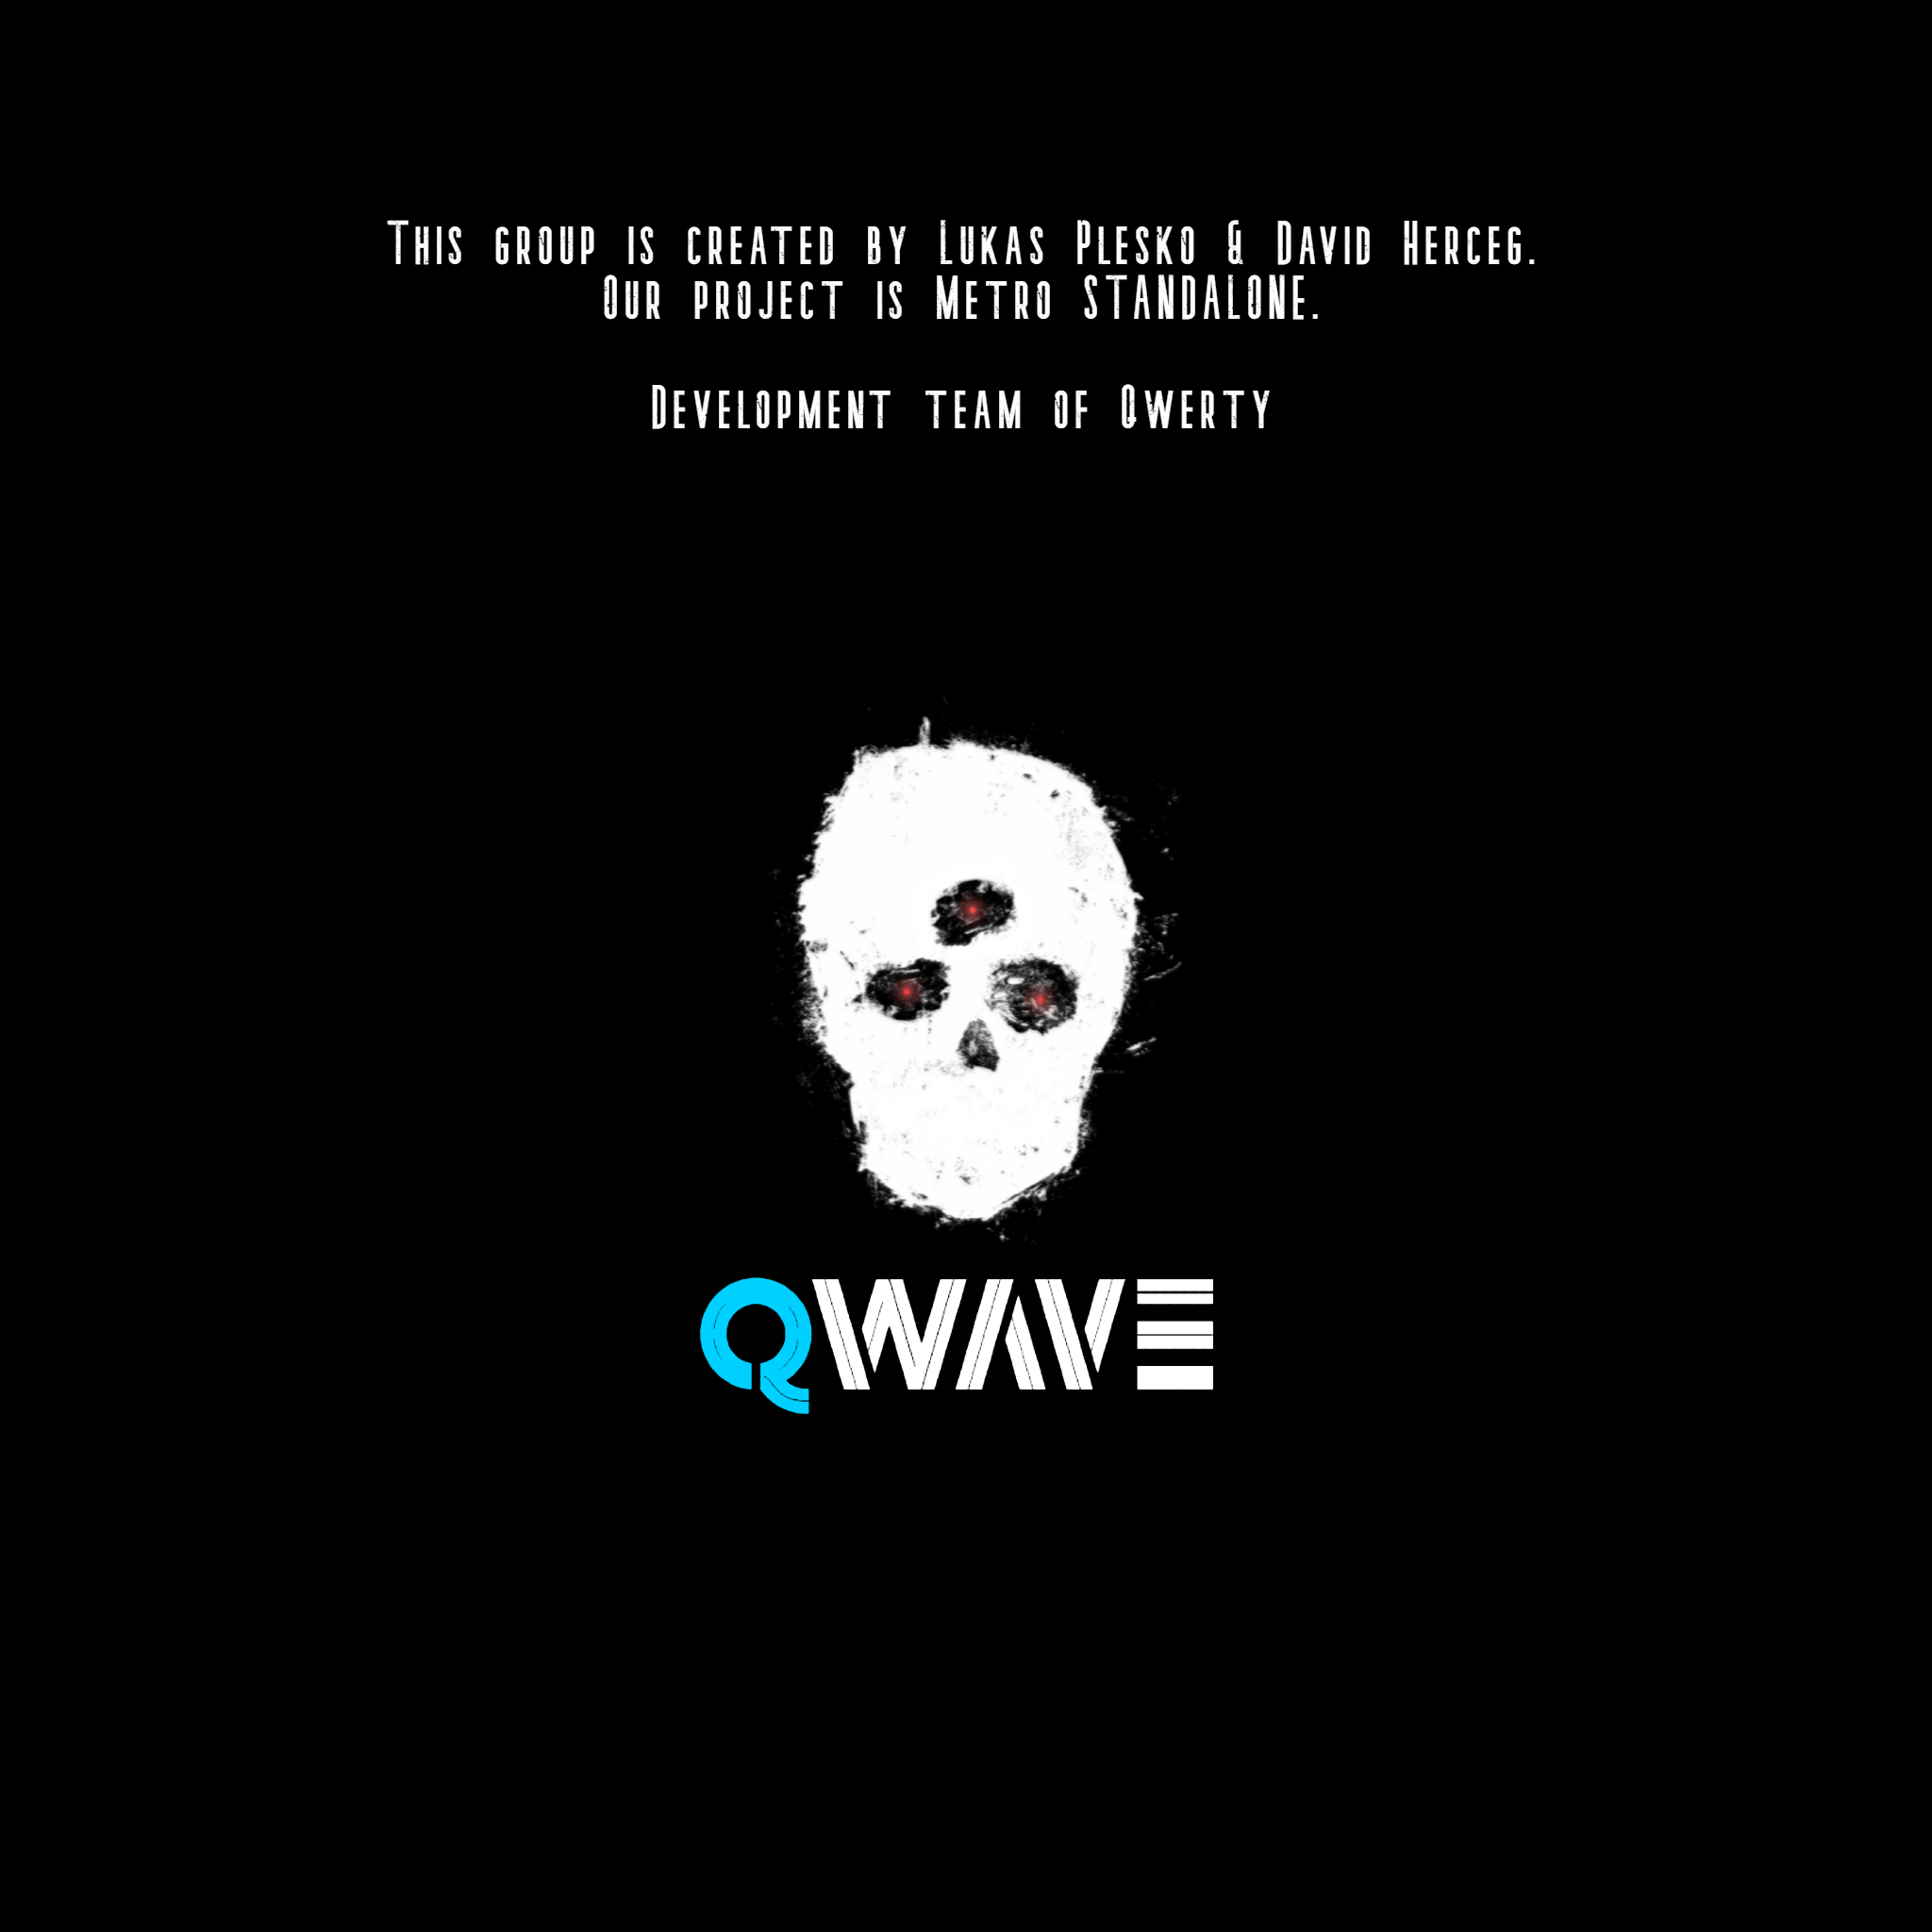 qwave 4